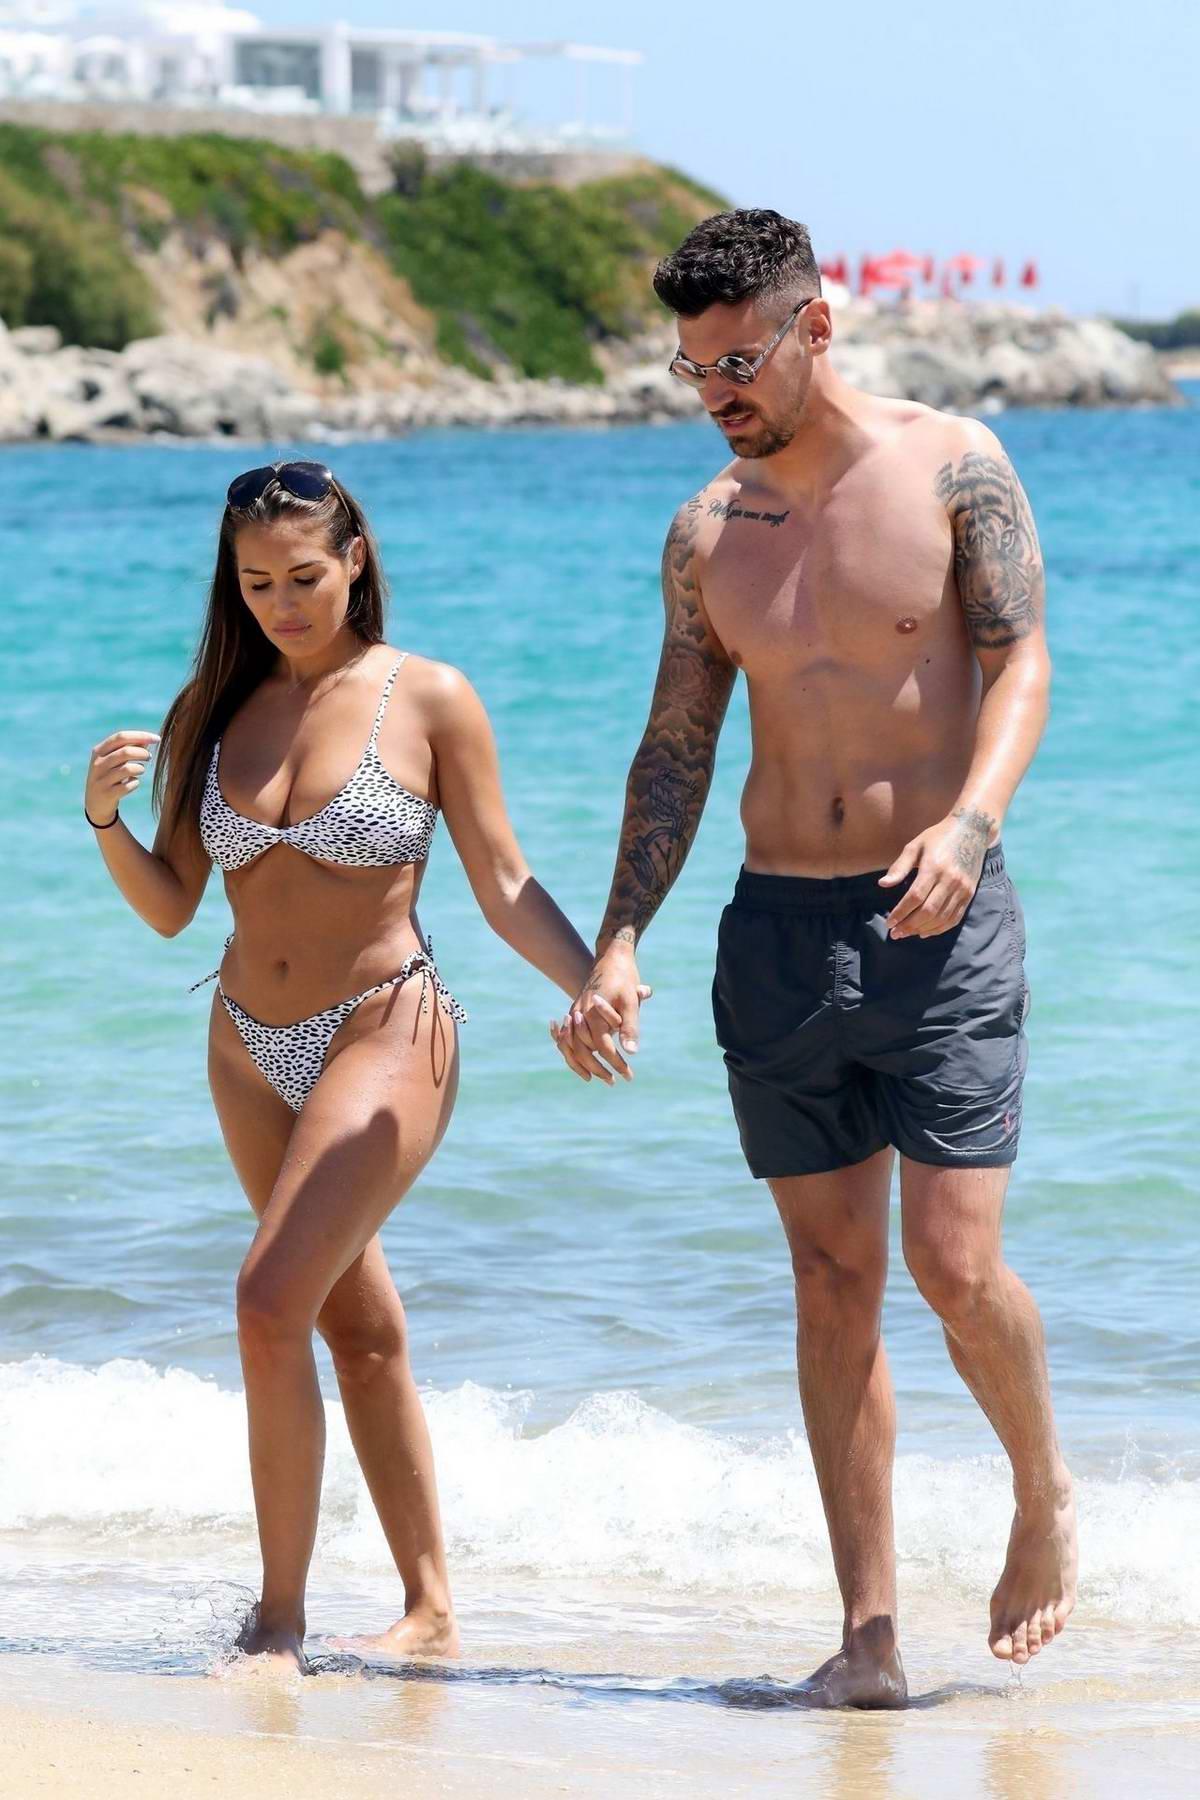 Chloe Goodman spotted in a bikini while enjoying the beach with boyfriend Grant Hall in Mykonos, Greece